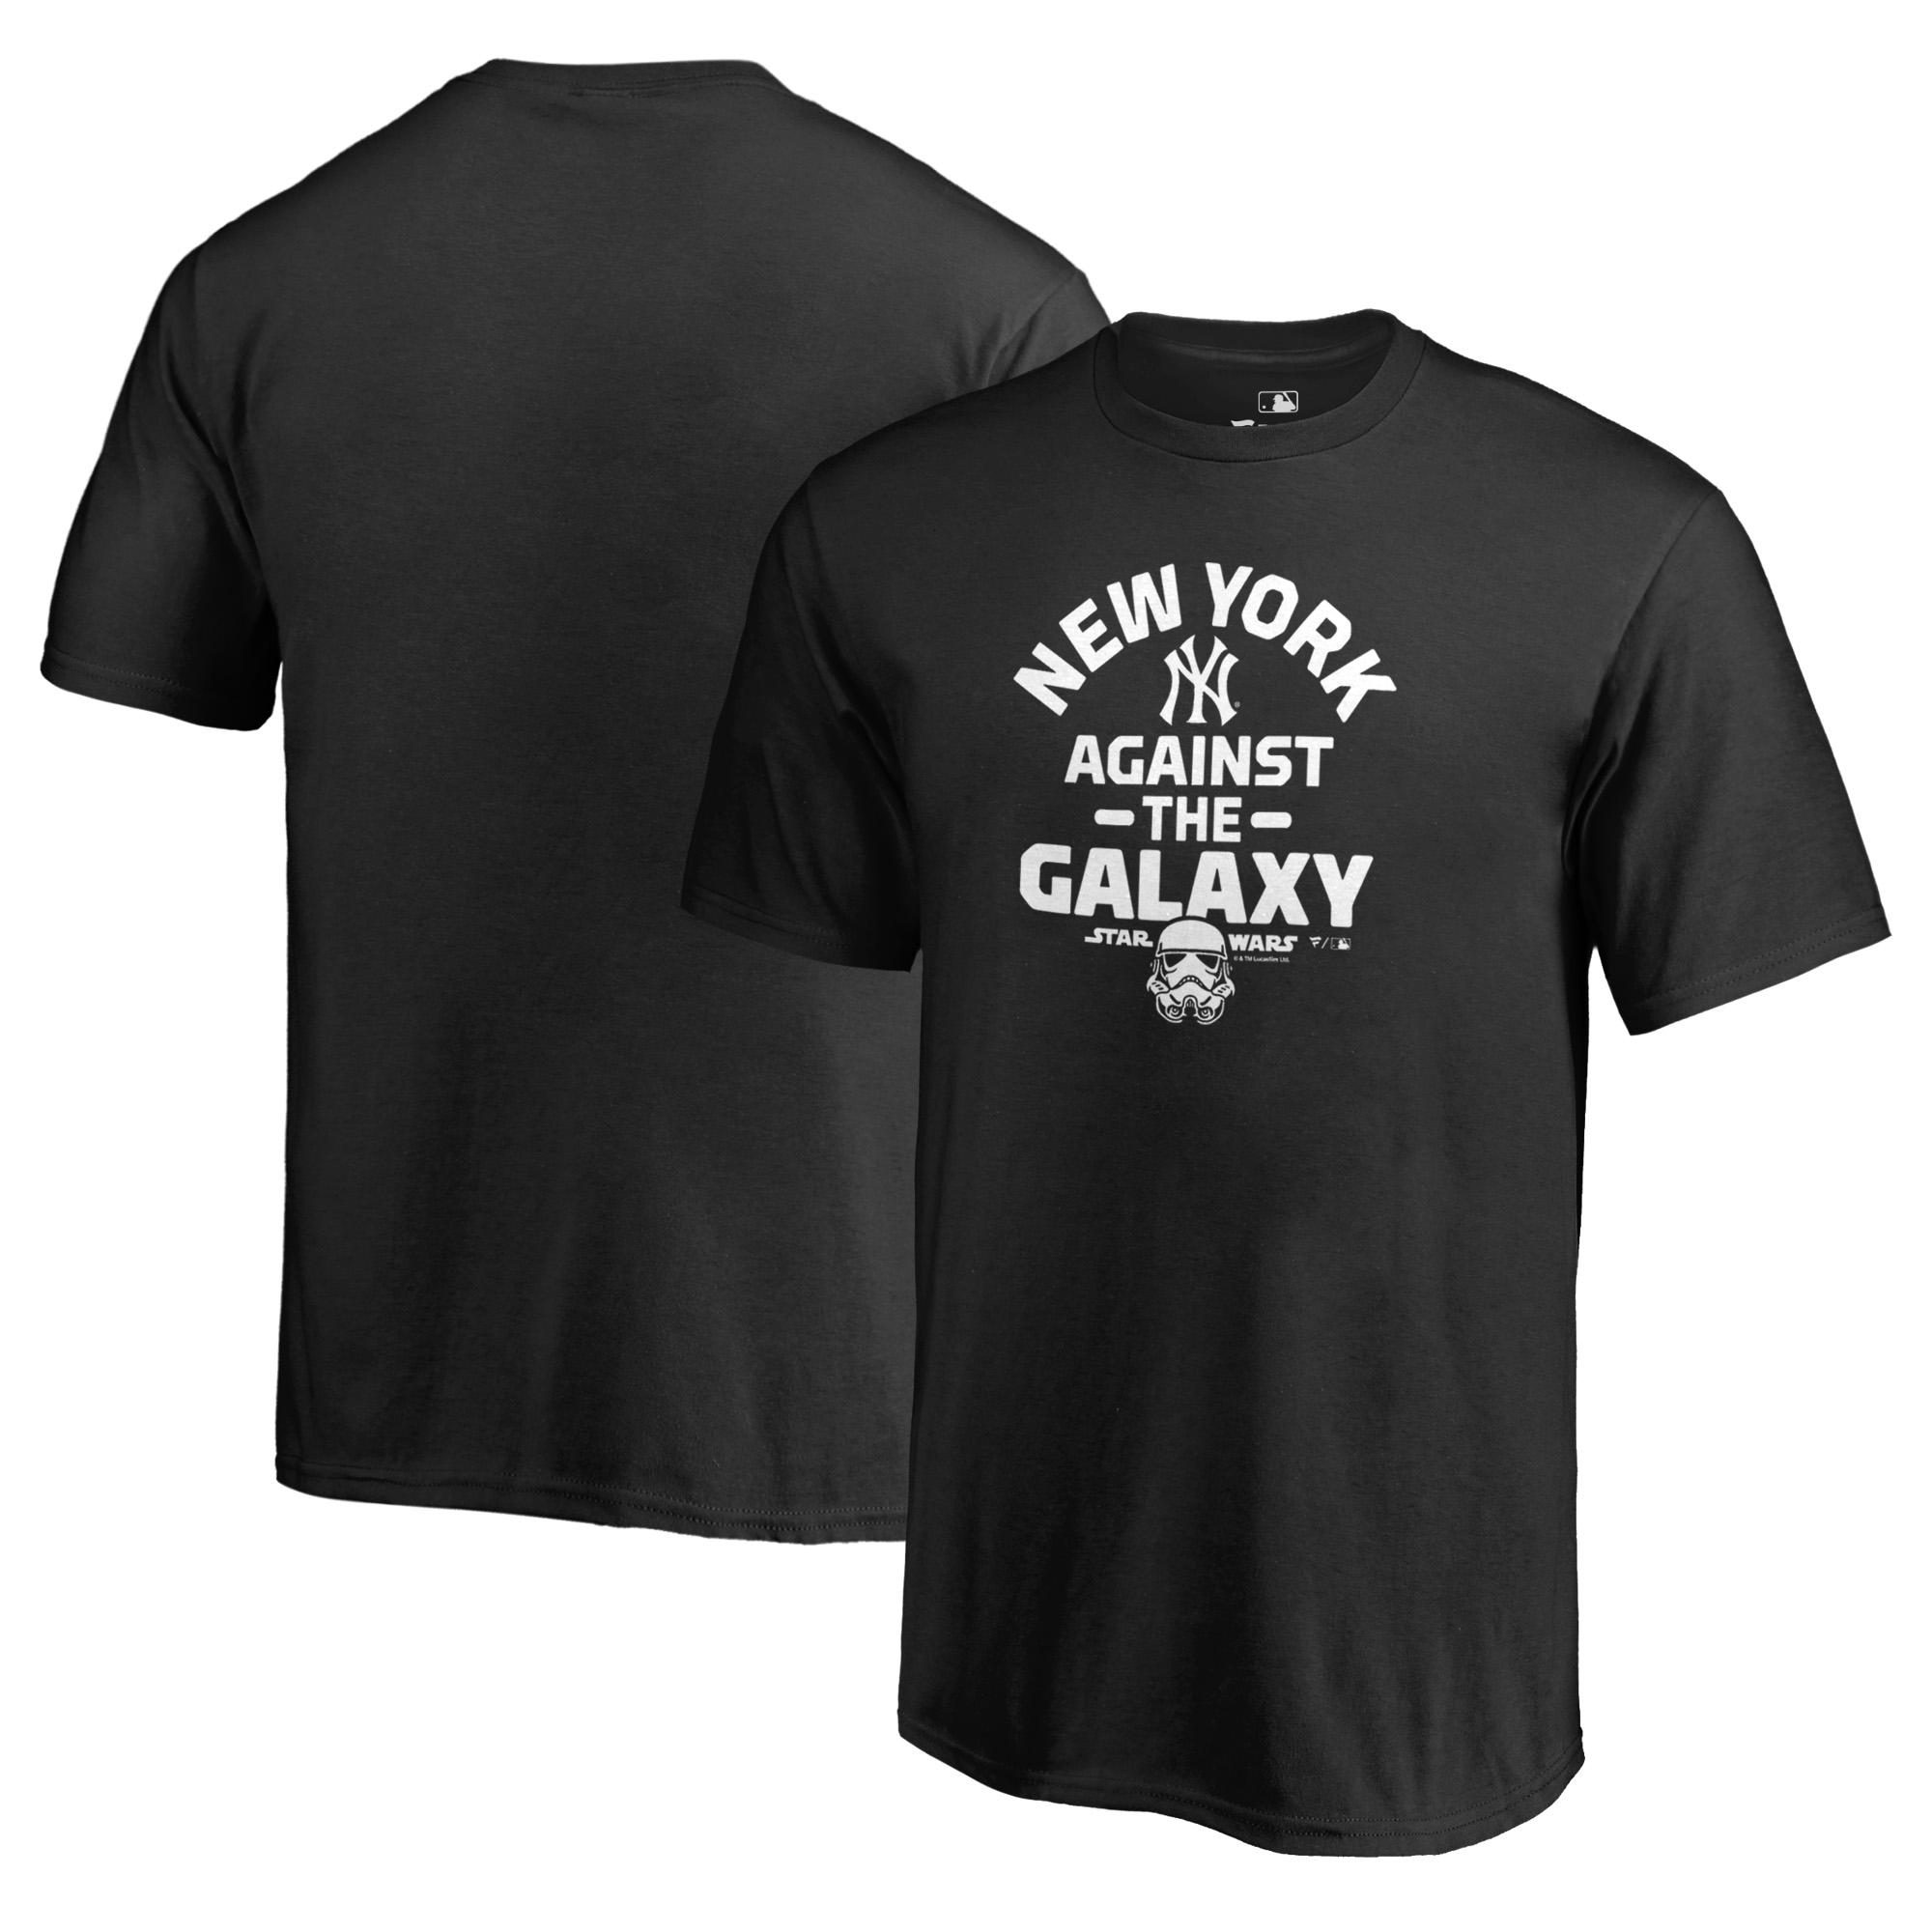 New York Yankees Fanatics Branded Youth MLB Star Wars Against The Galaxy T-Shirt - Black